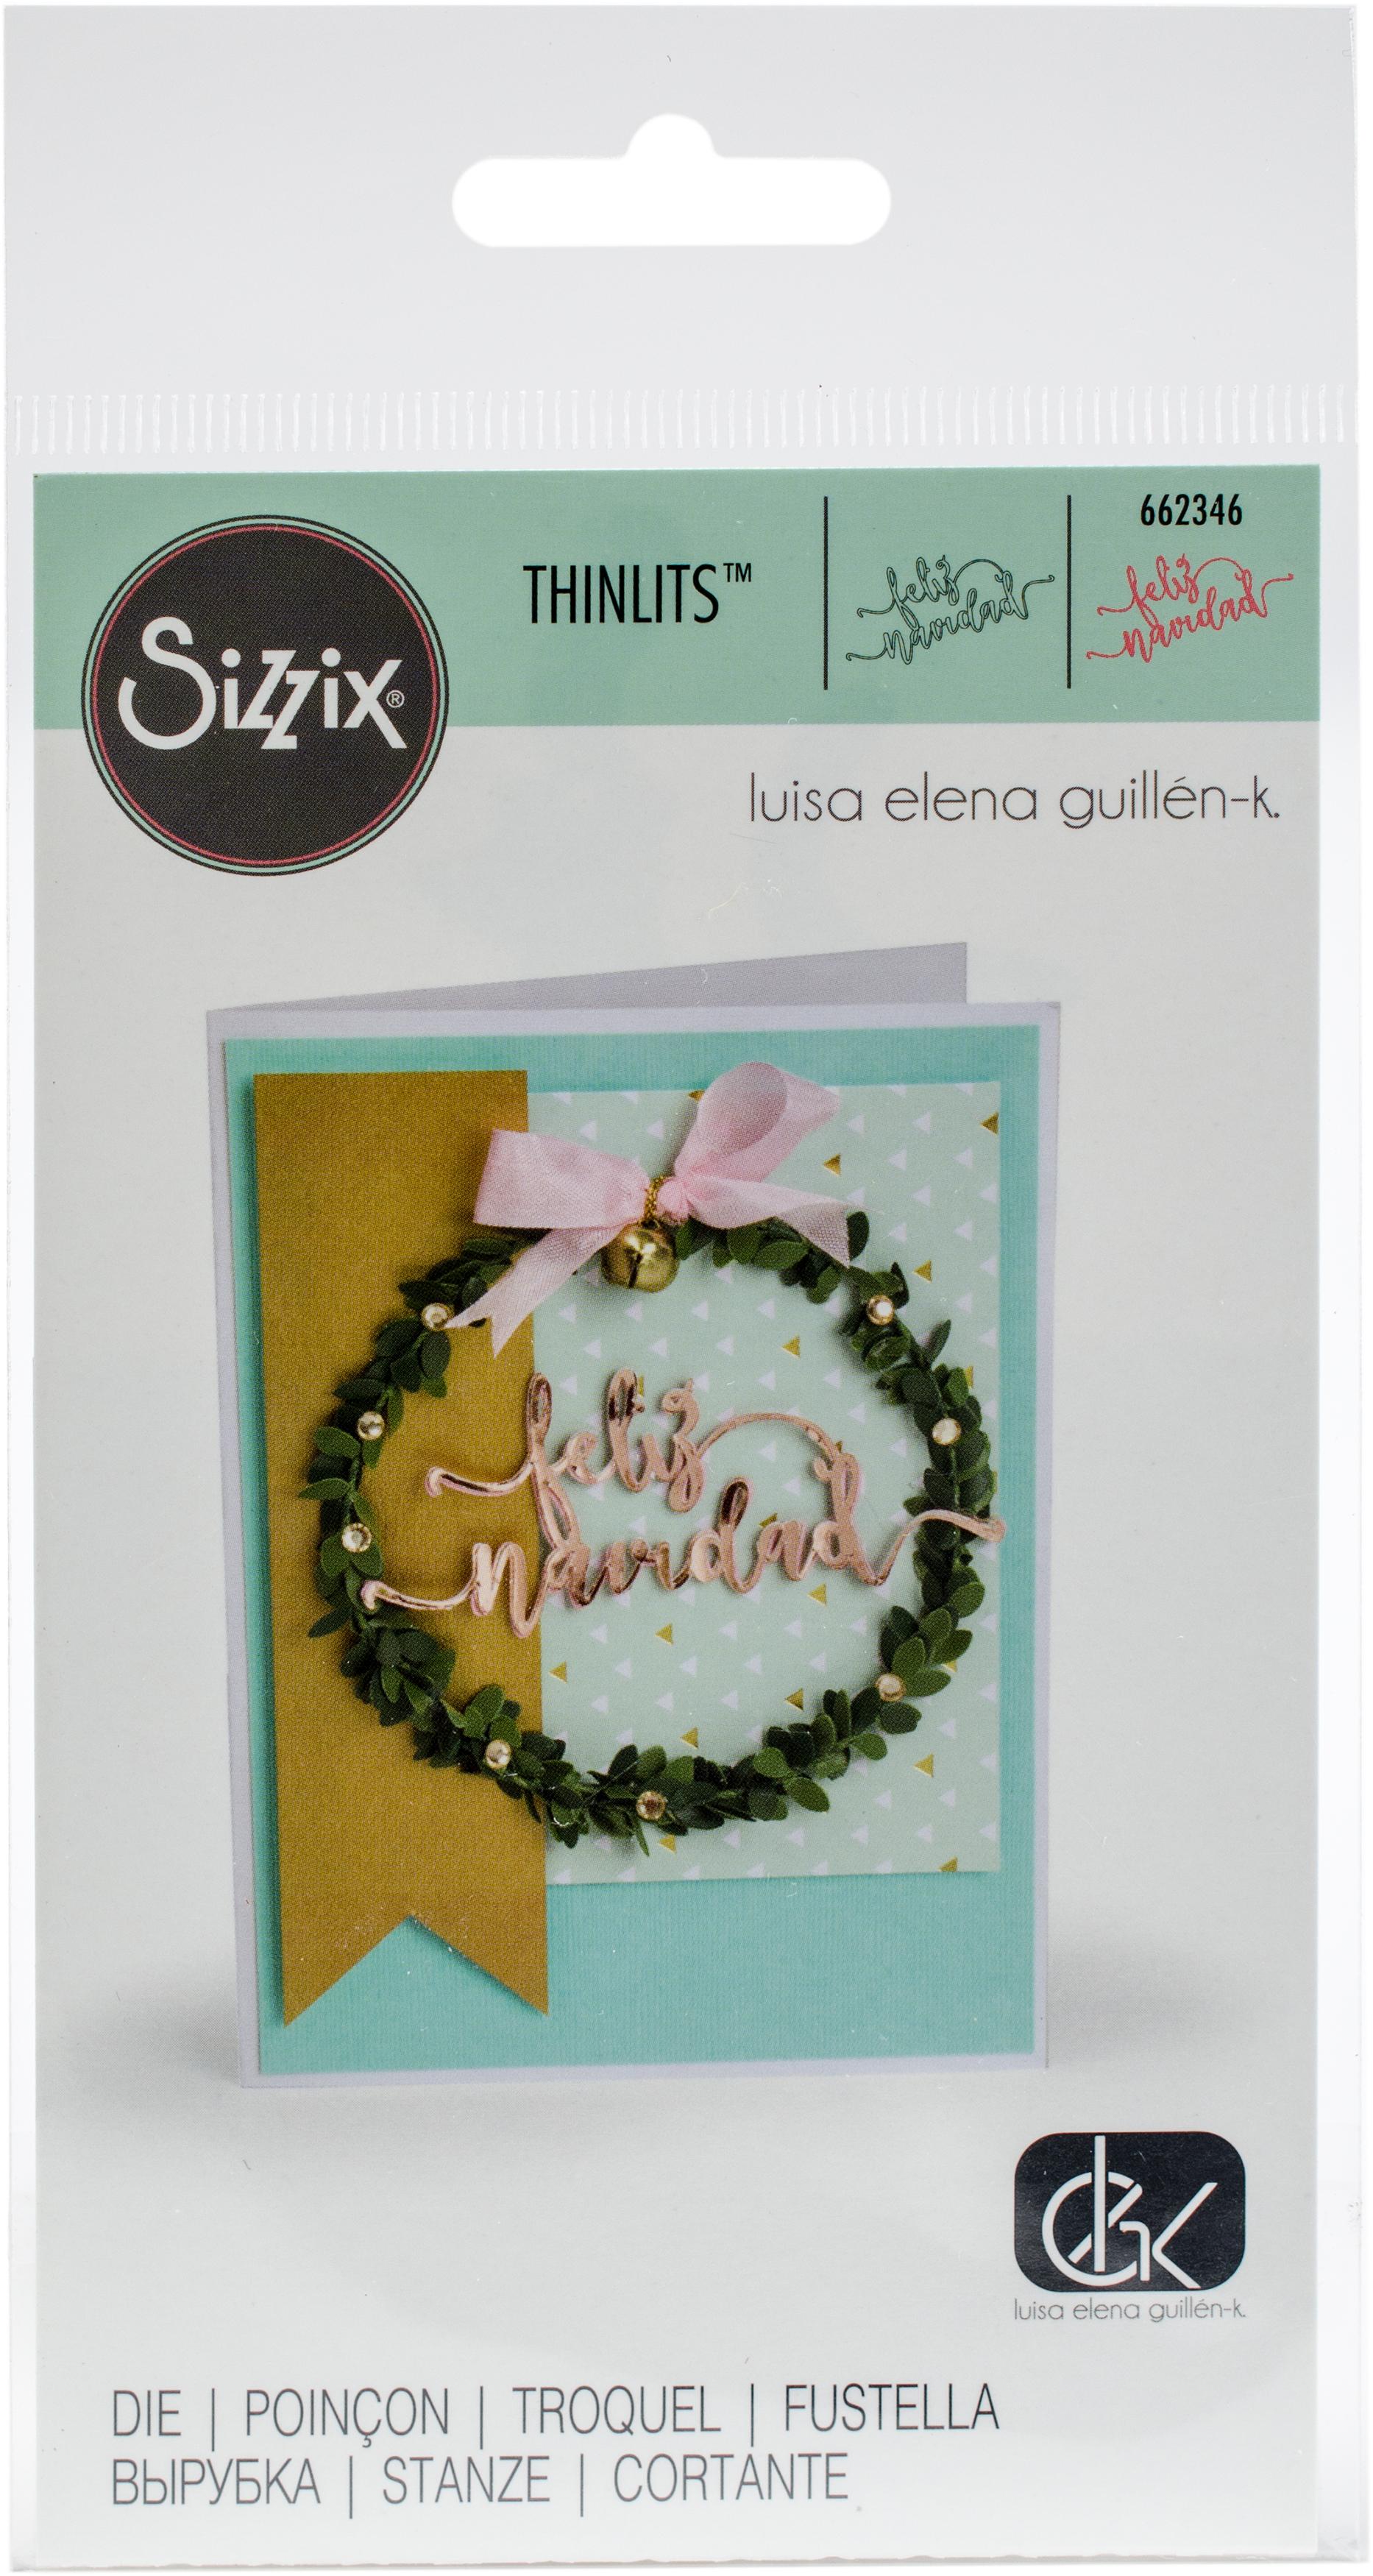 Sizzix Thinlits Dies By Luisa Elena Guillen-Feliz Navidad (Merry Christmas)